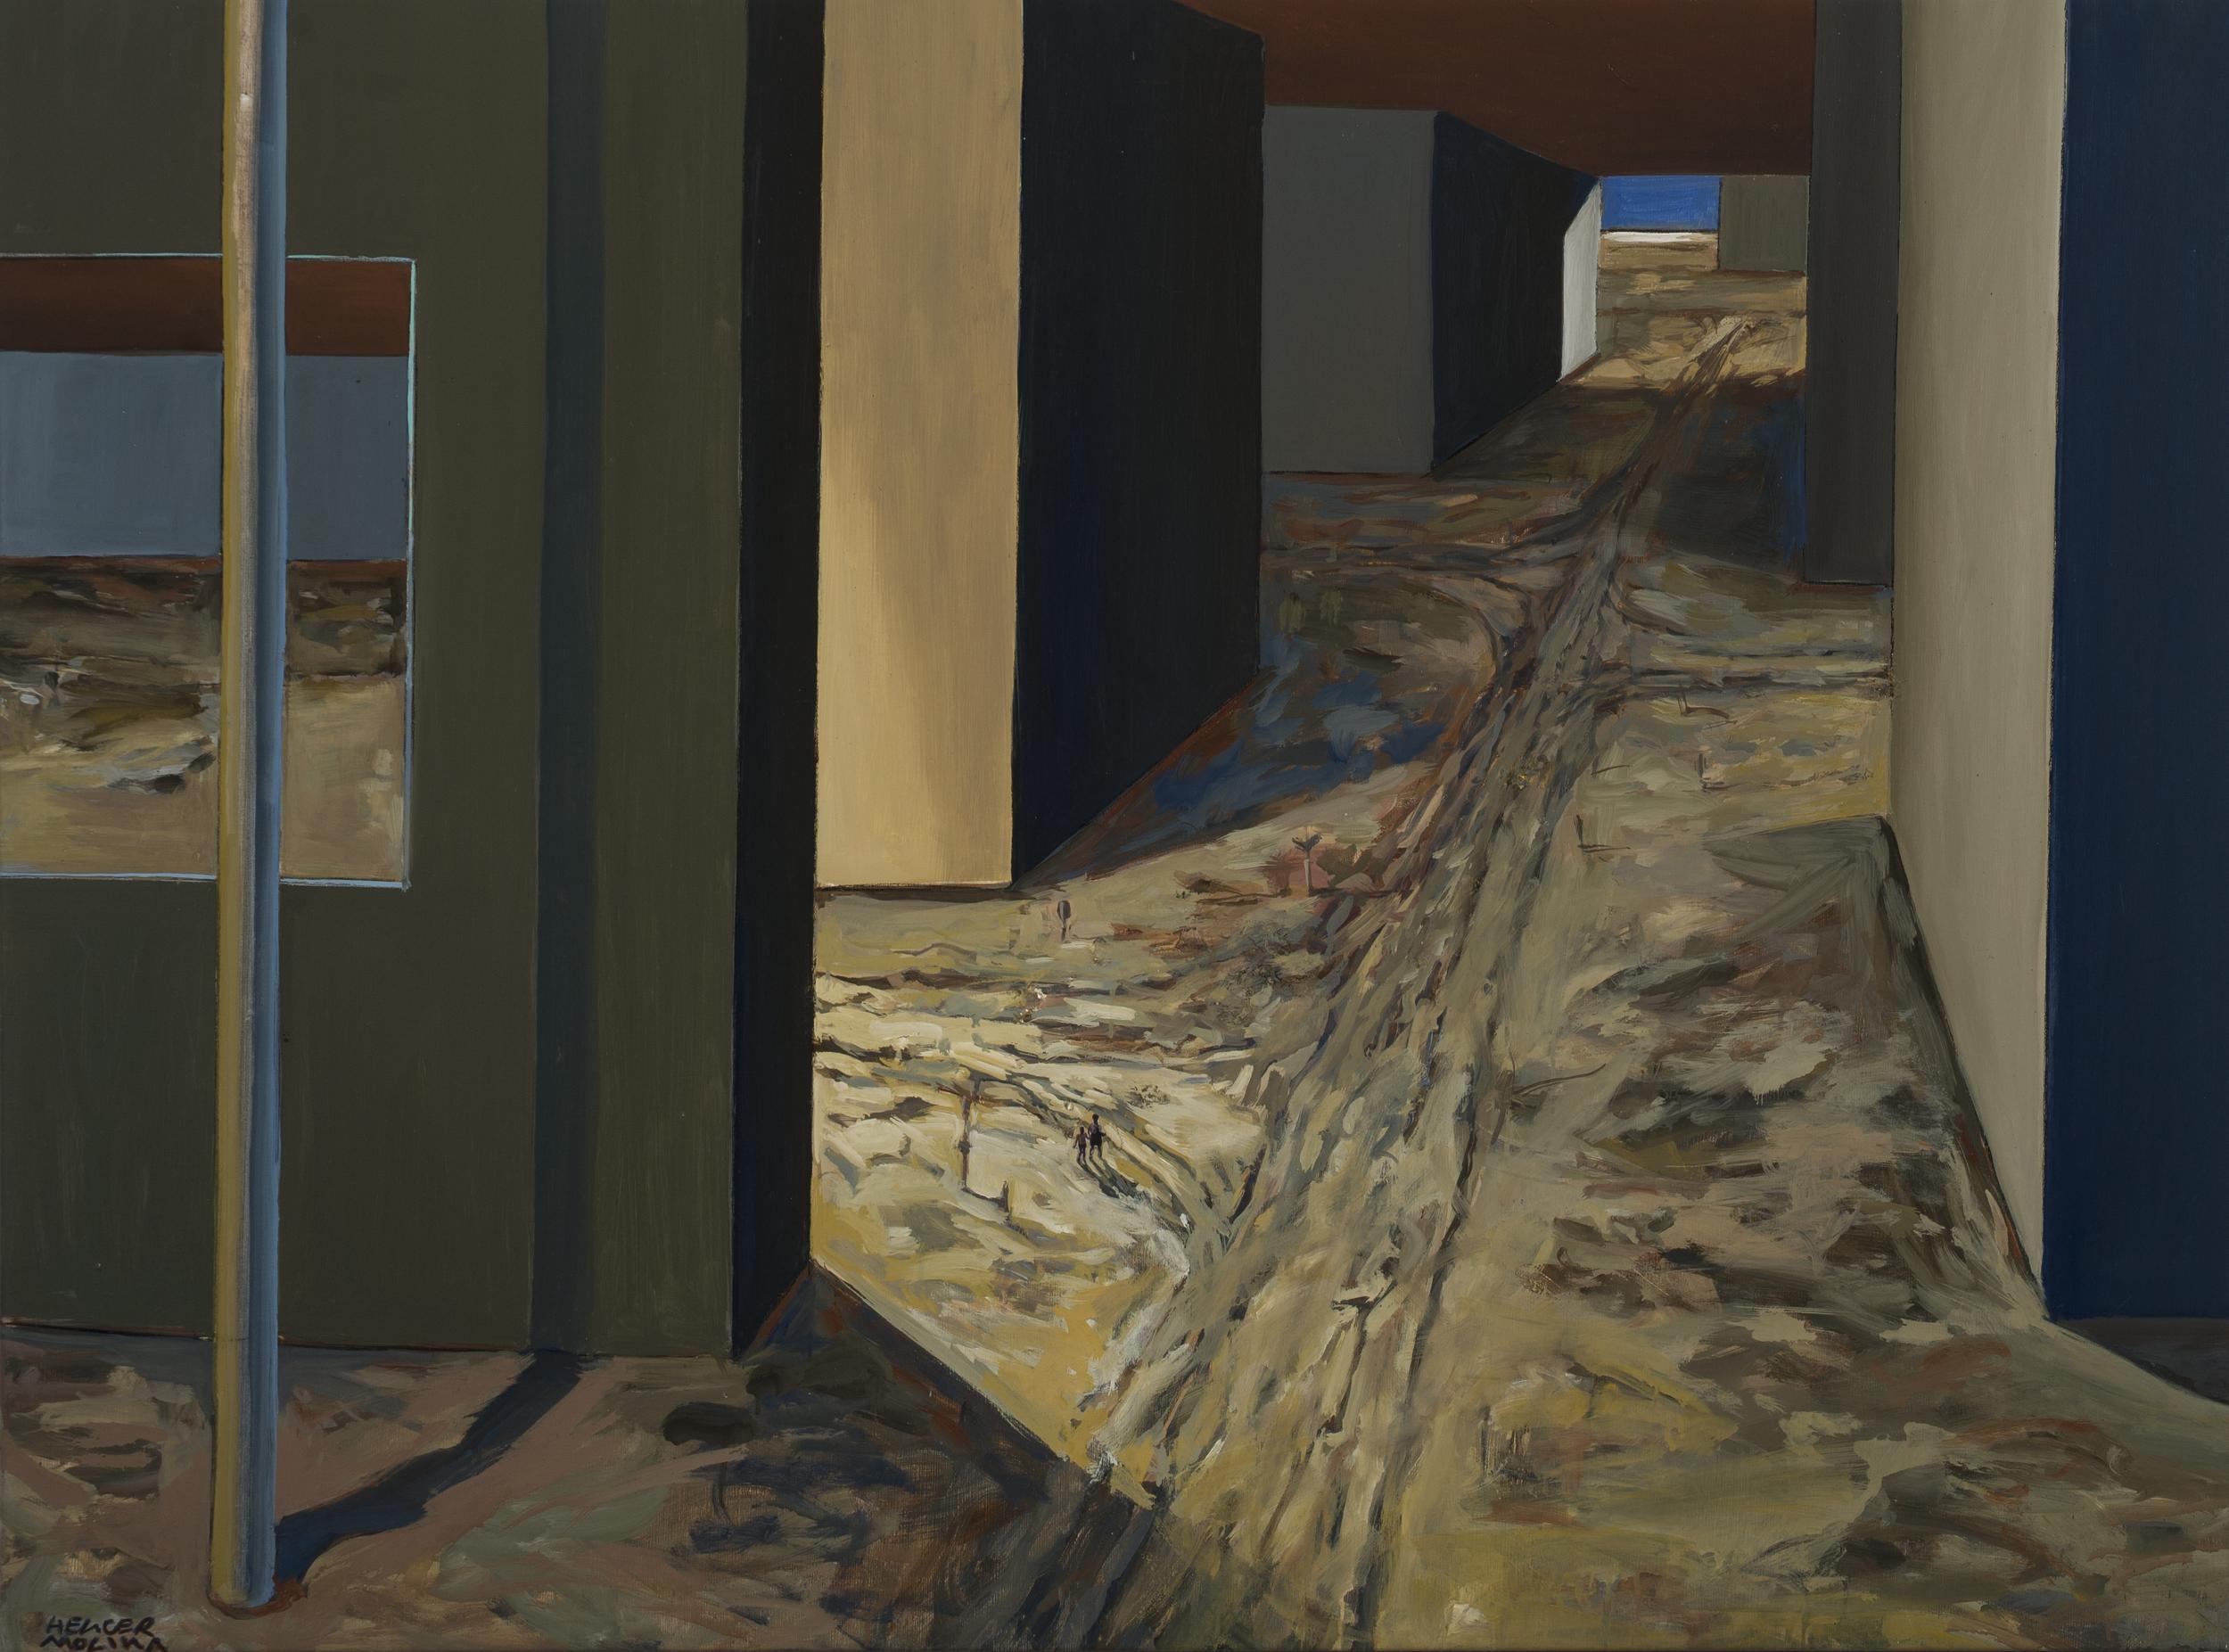 The Return, Oil on Canvas, 38 x 51